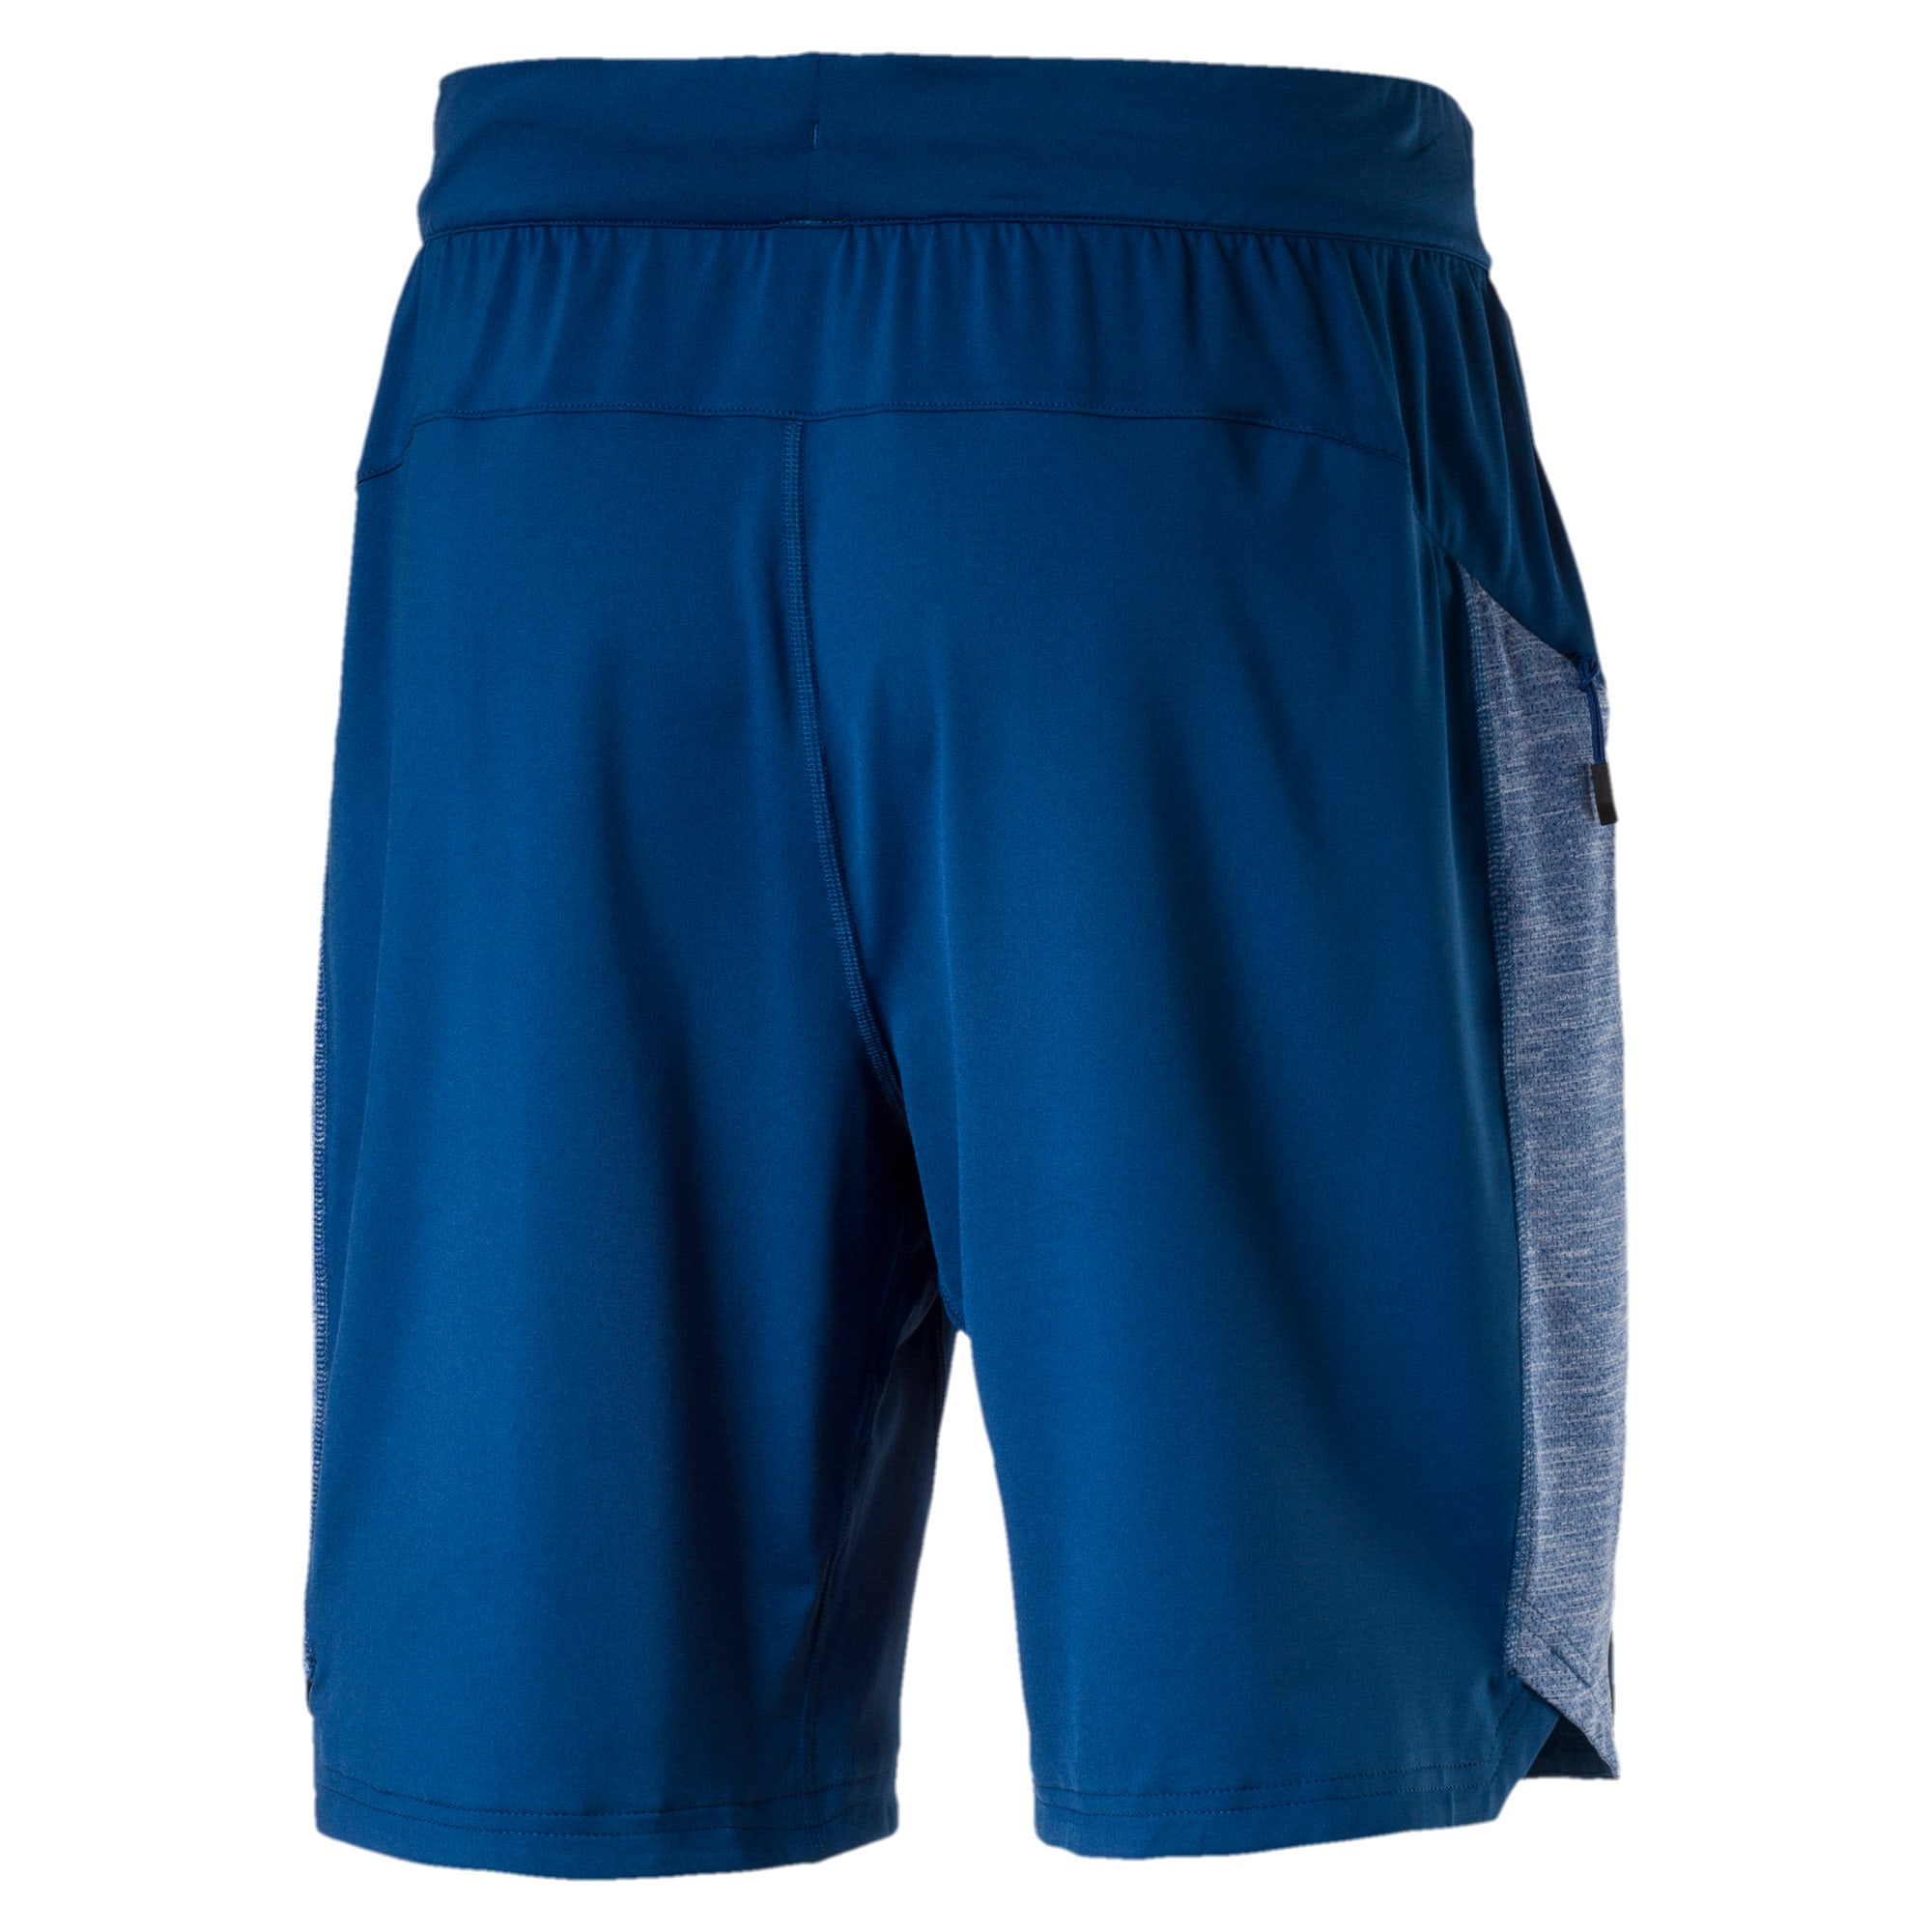 Thumbnail 6 of Active Training Men's Bonded Tech Shorts, TRUE BLUE-TRUE BLUE Heather, medium-IND